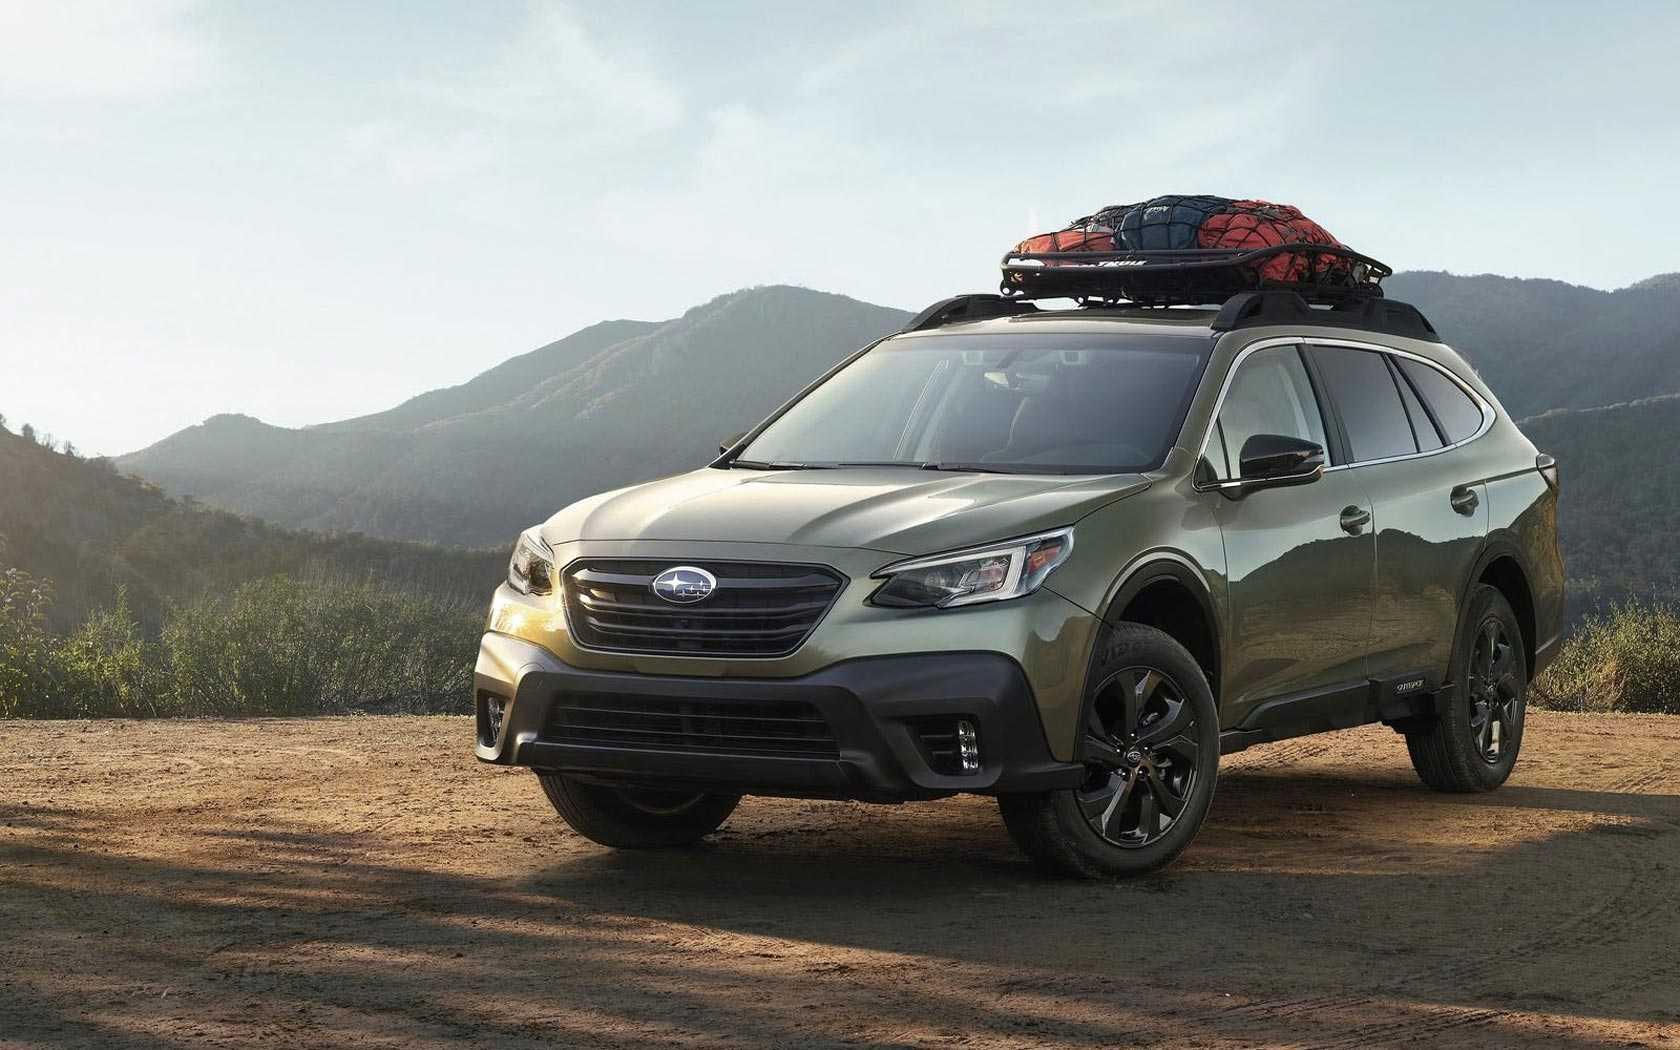 Subaru outback 2019-2020 - фото модели, цена и комплектация, характеристики субару аутбек 6